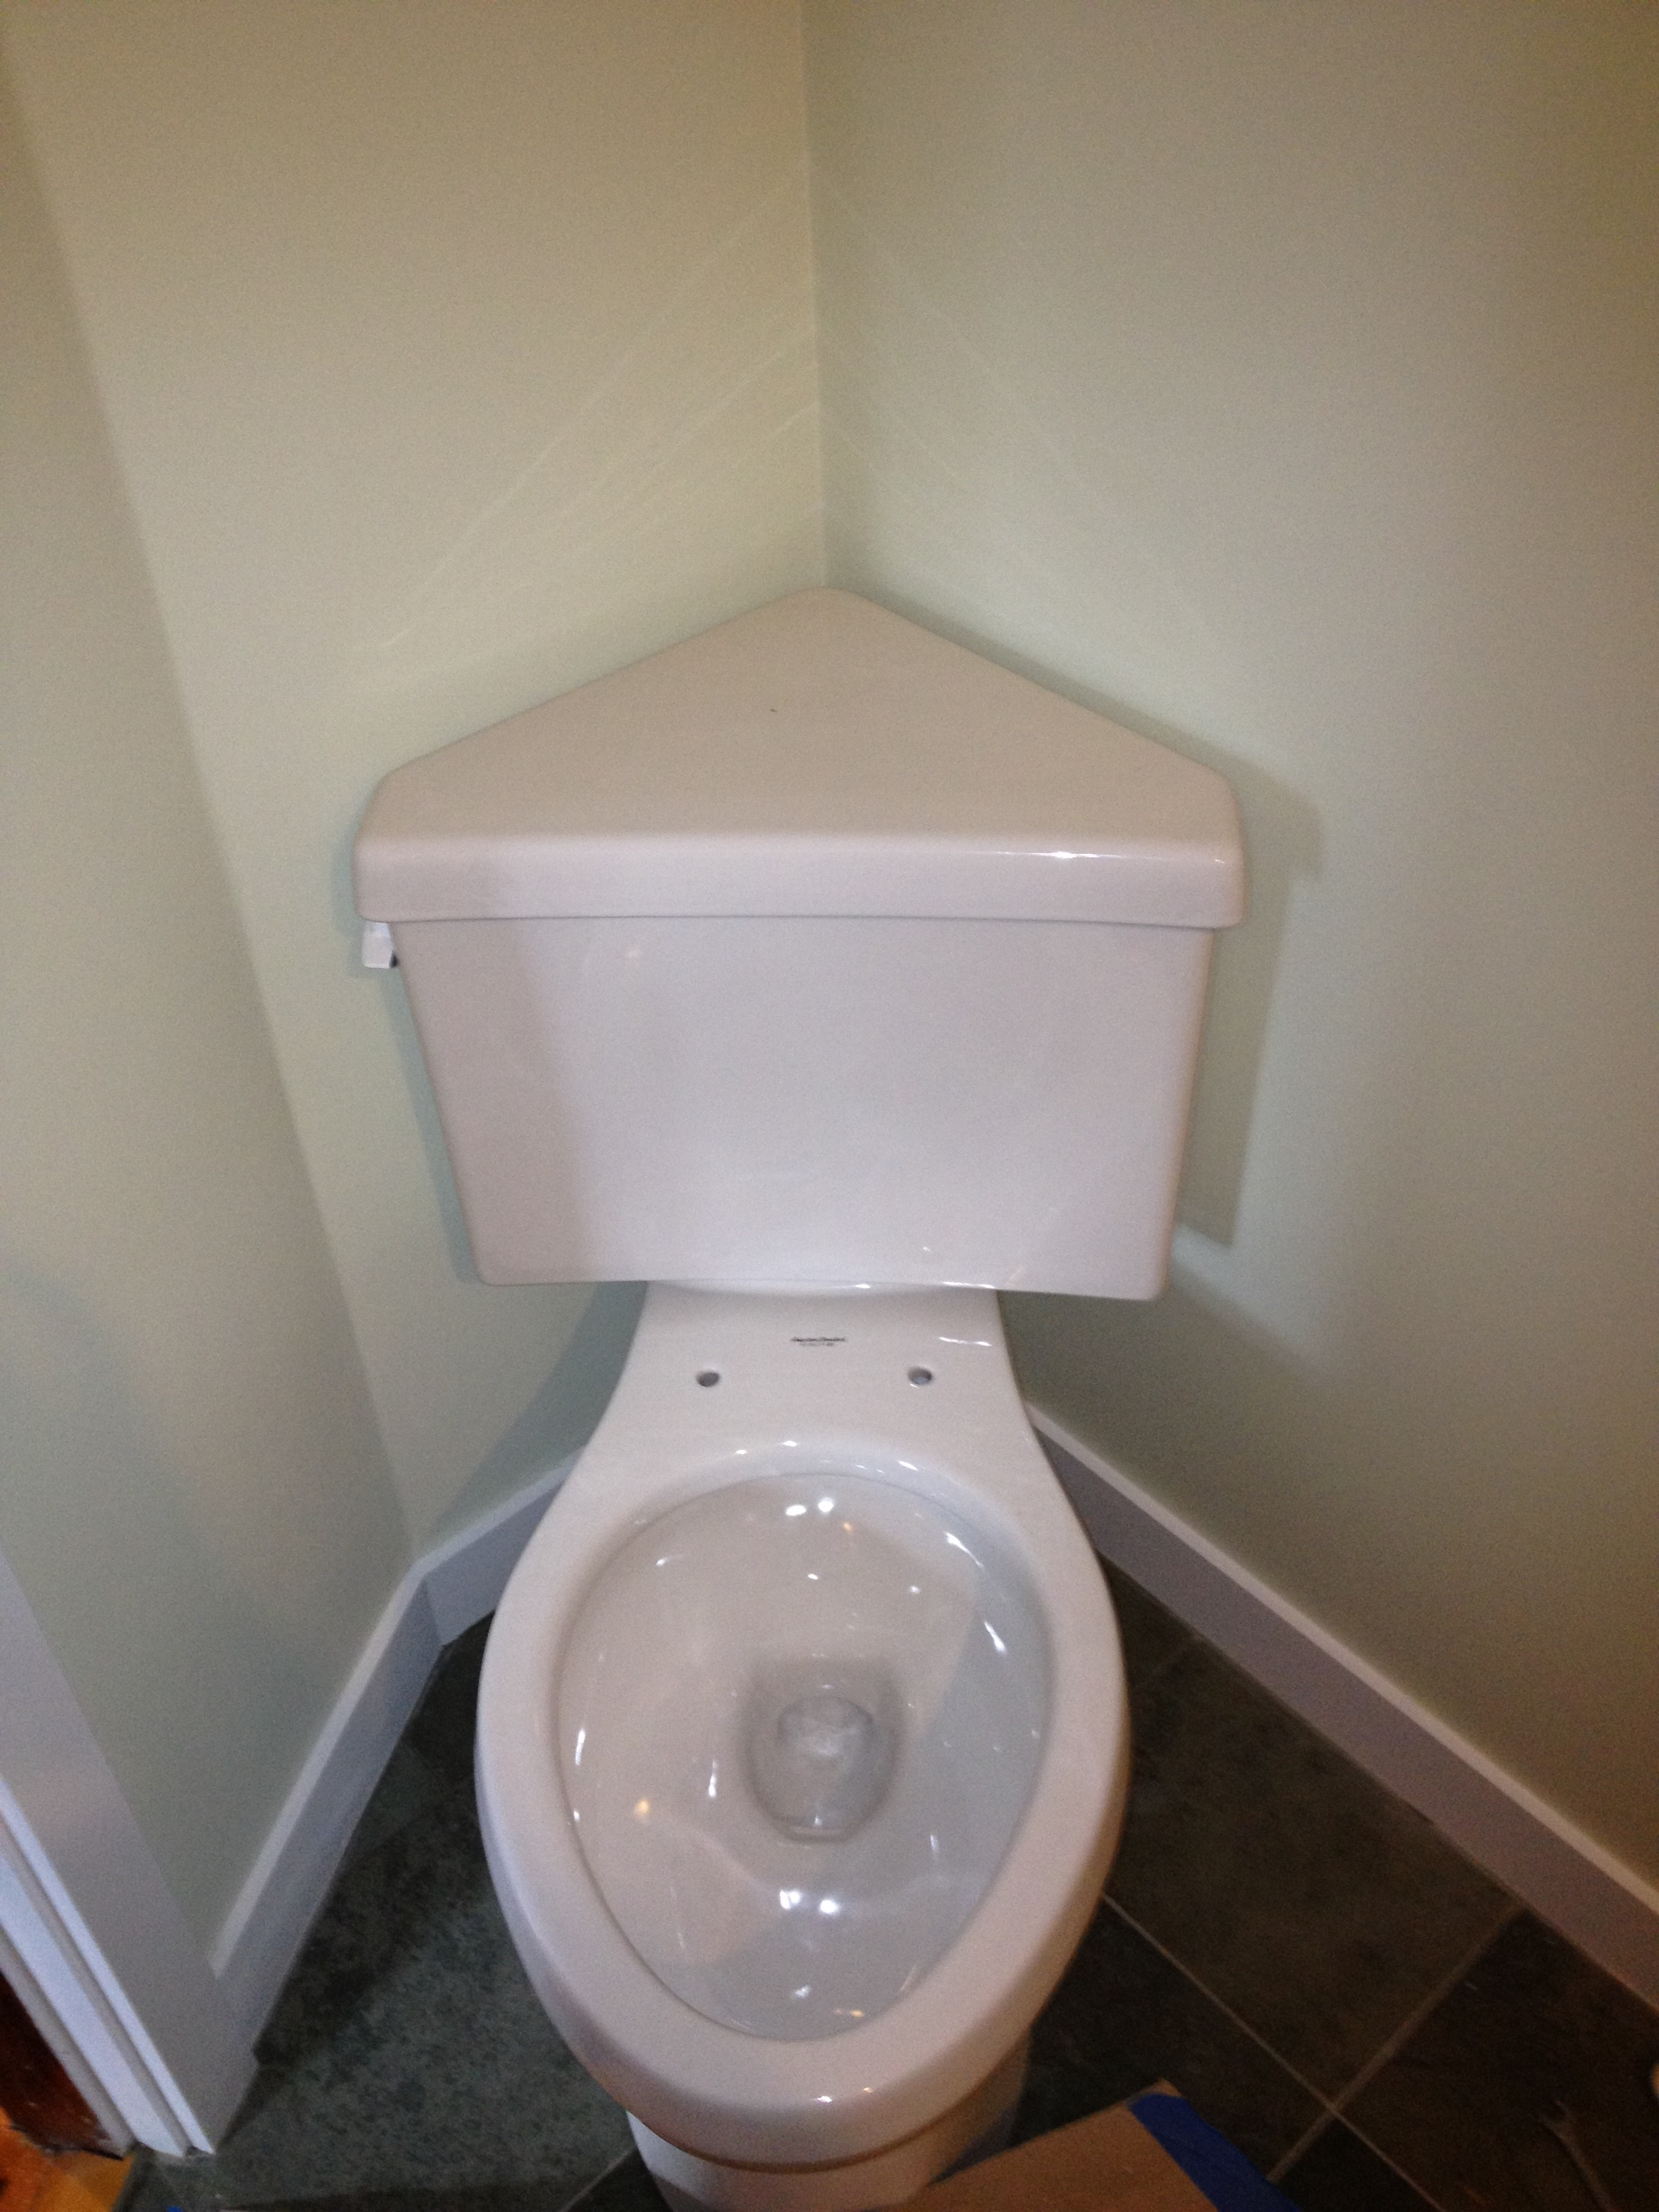 Wall Hung Propane Heaters Custom Toilet Install Framingham MA - Kaufman Plumbing and ...